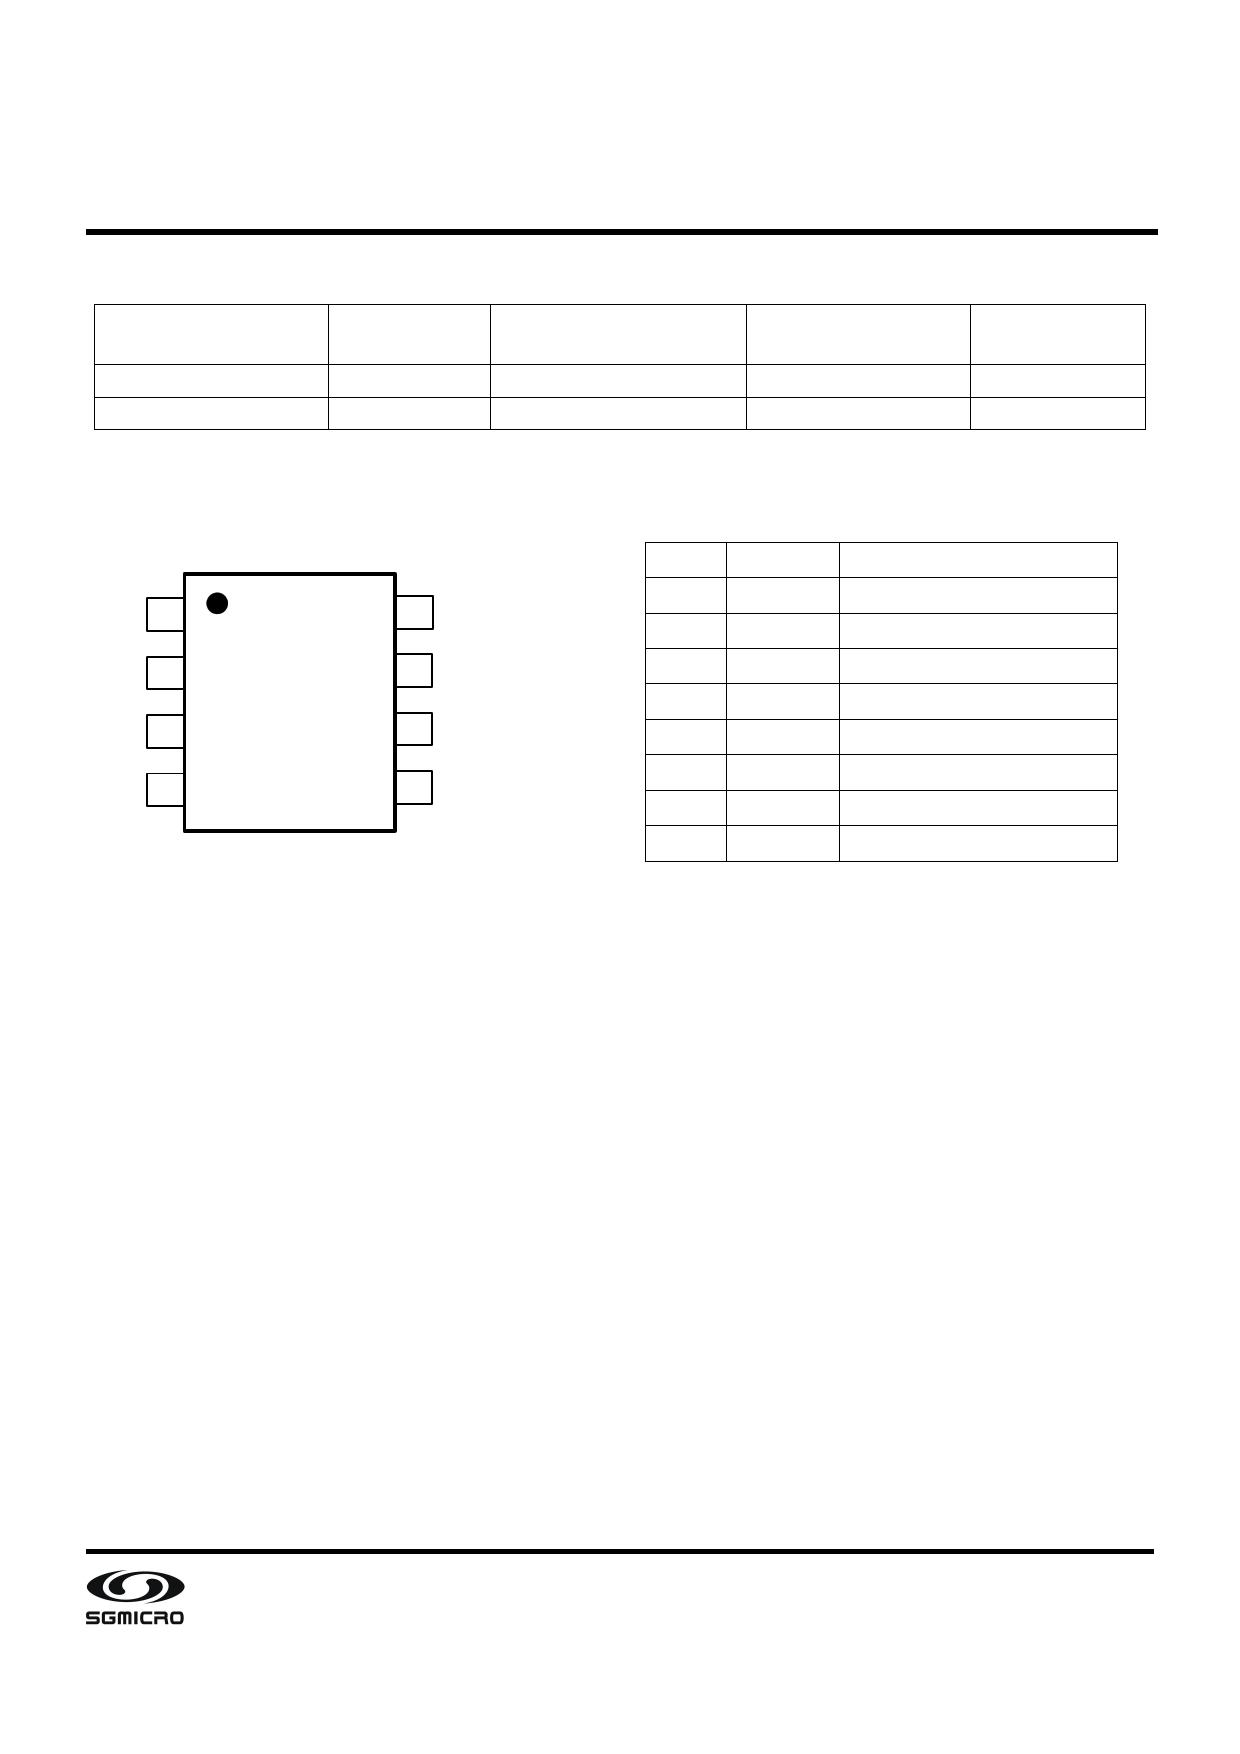 SGM9119 pdf, schematic